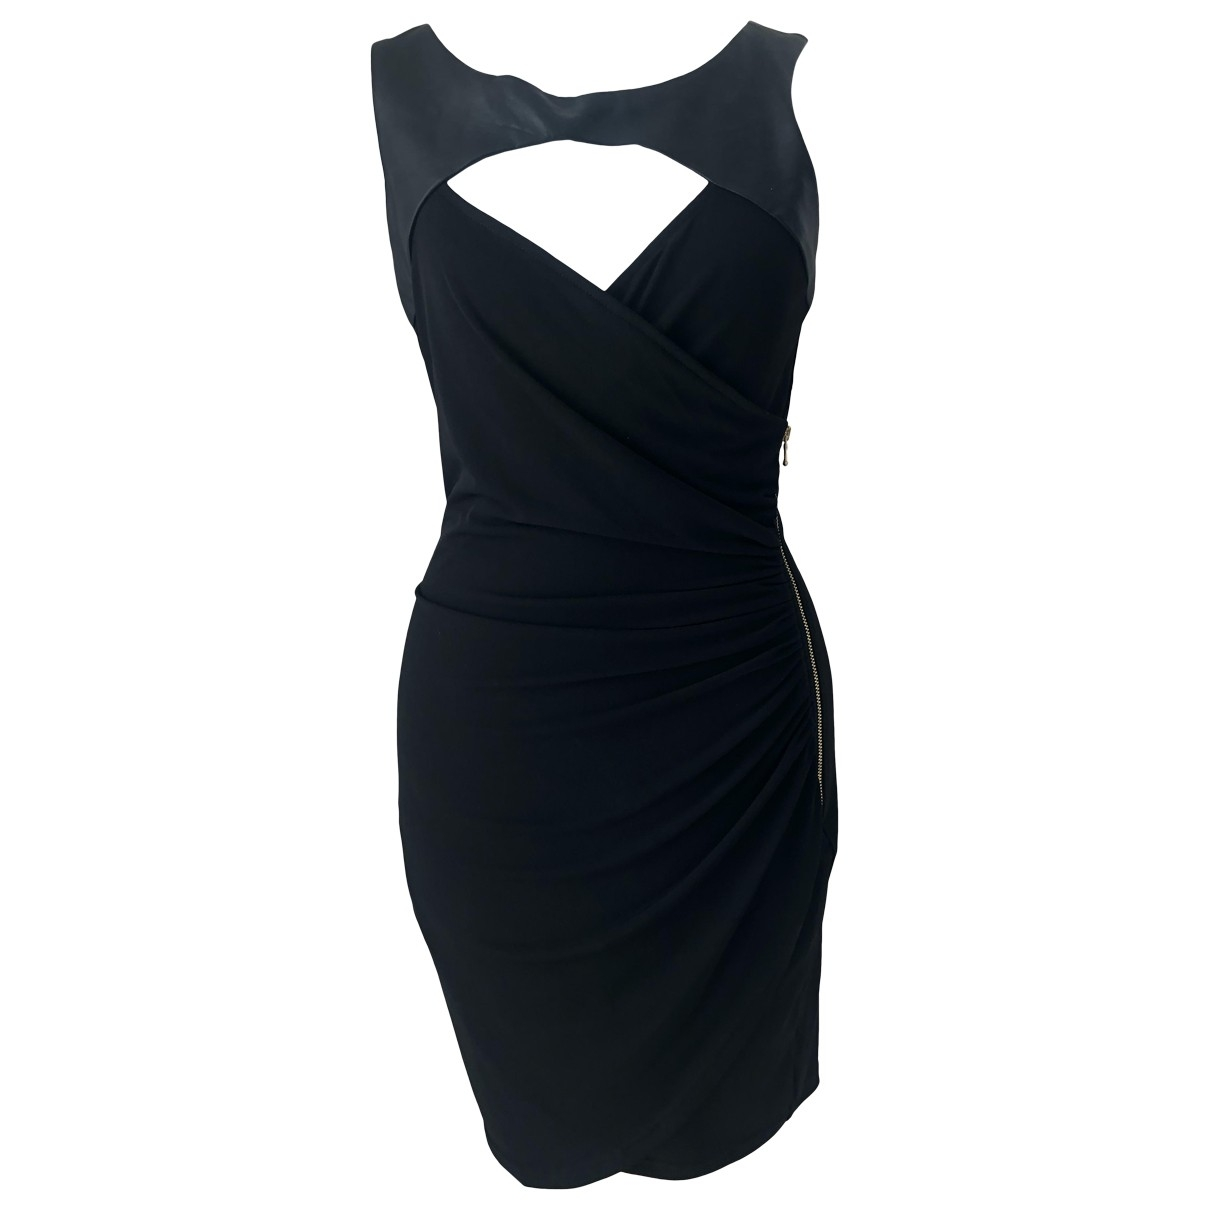 Guess \N Black dress for Women 36 FR